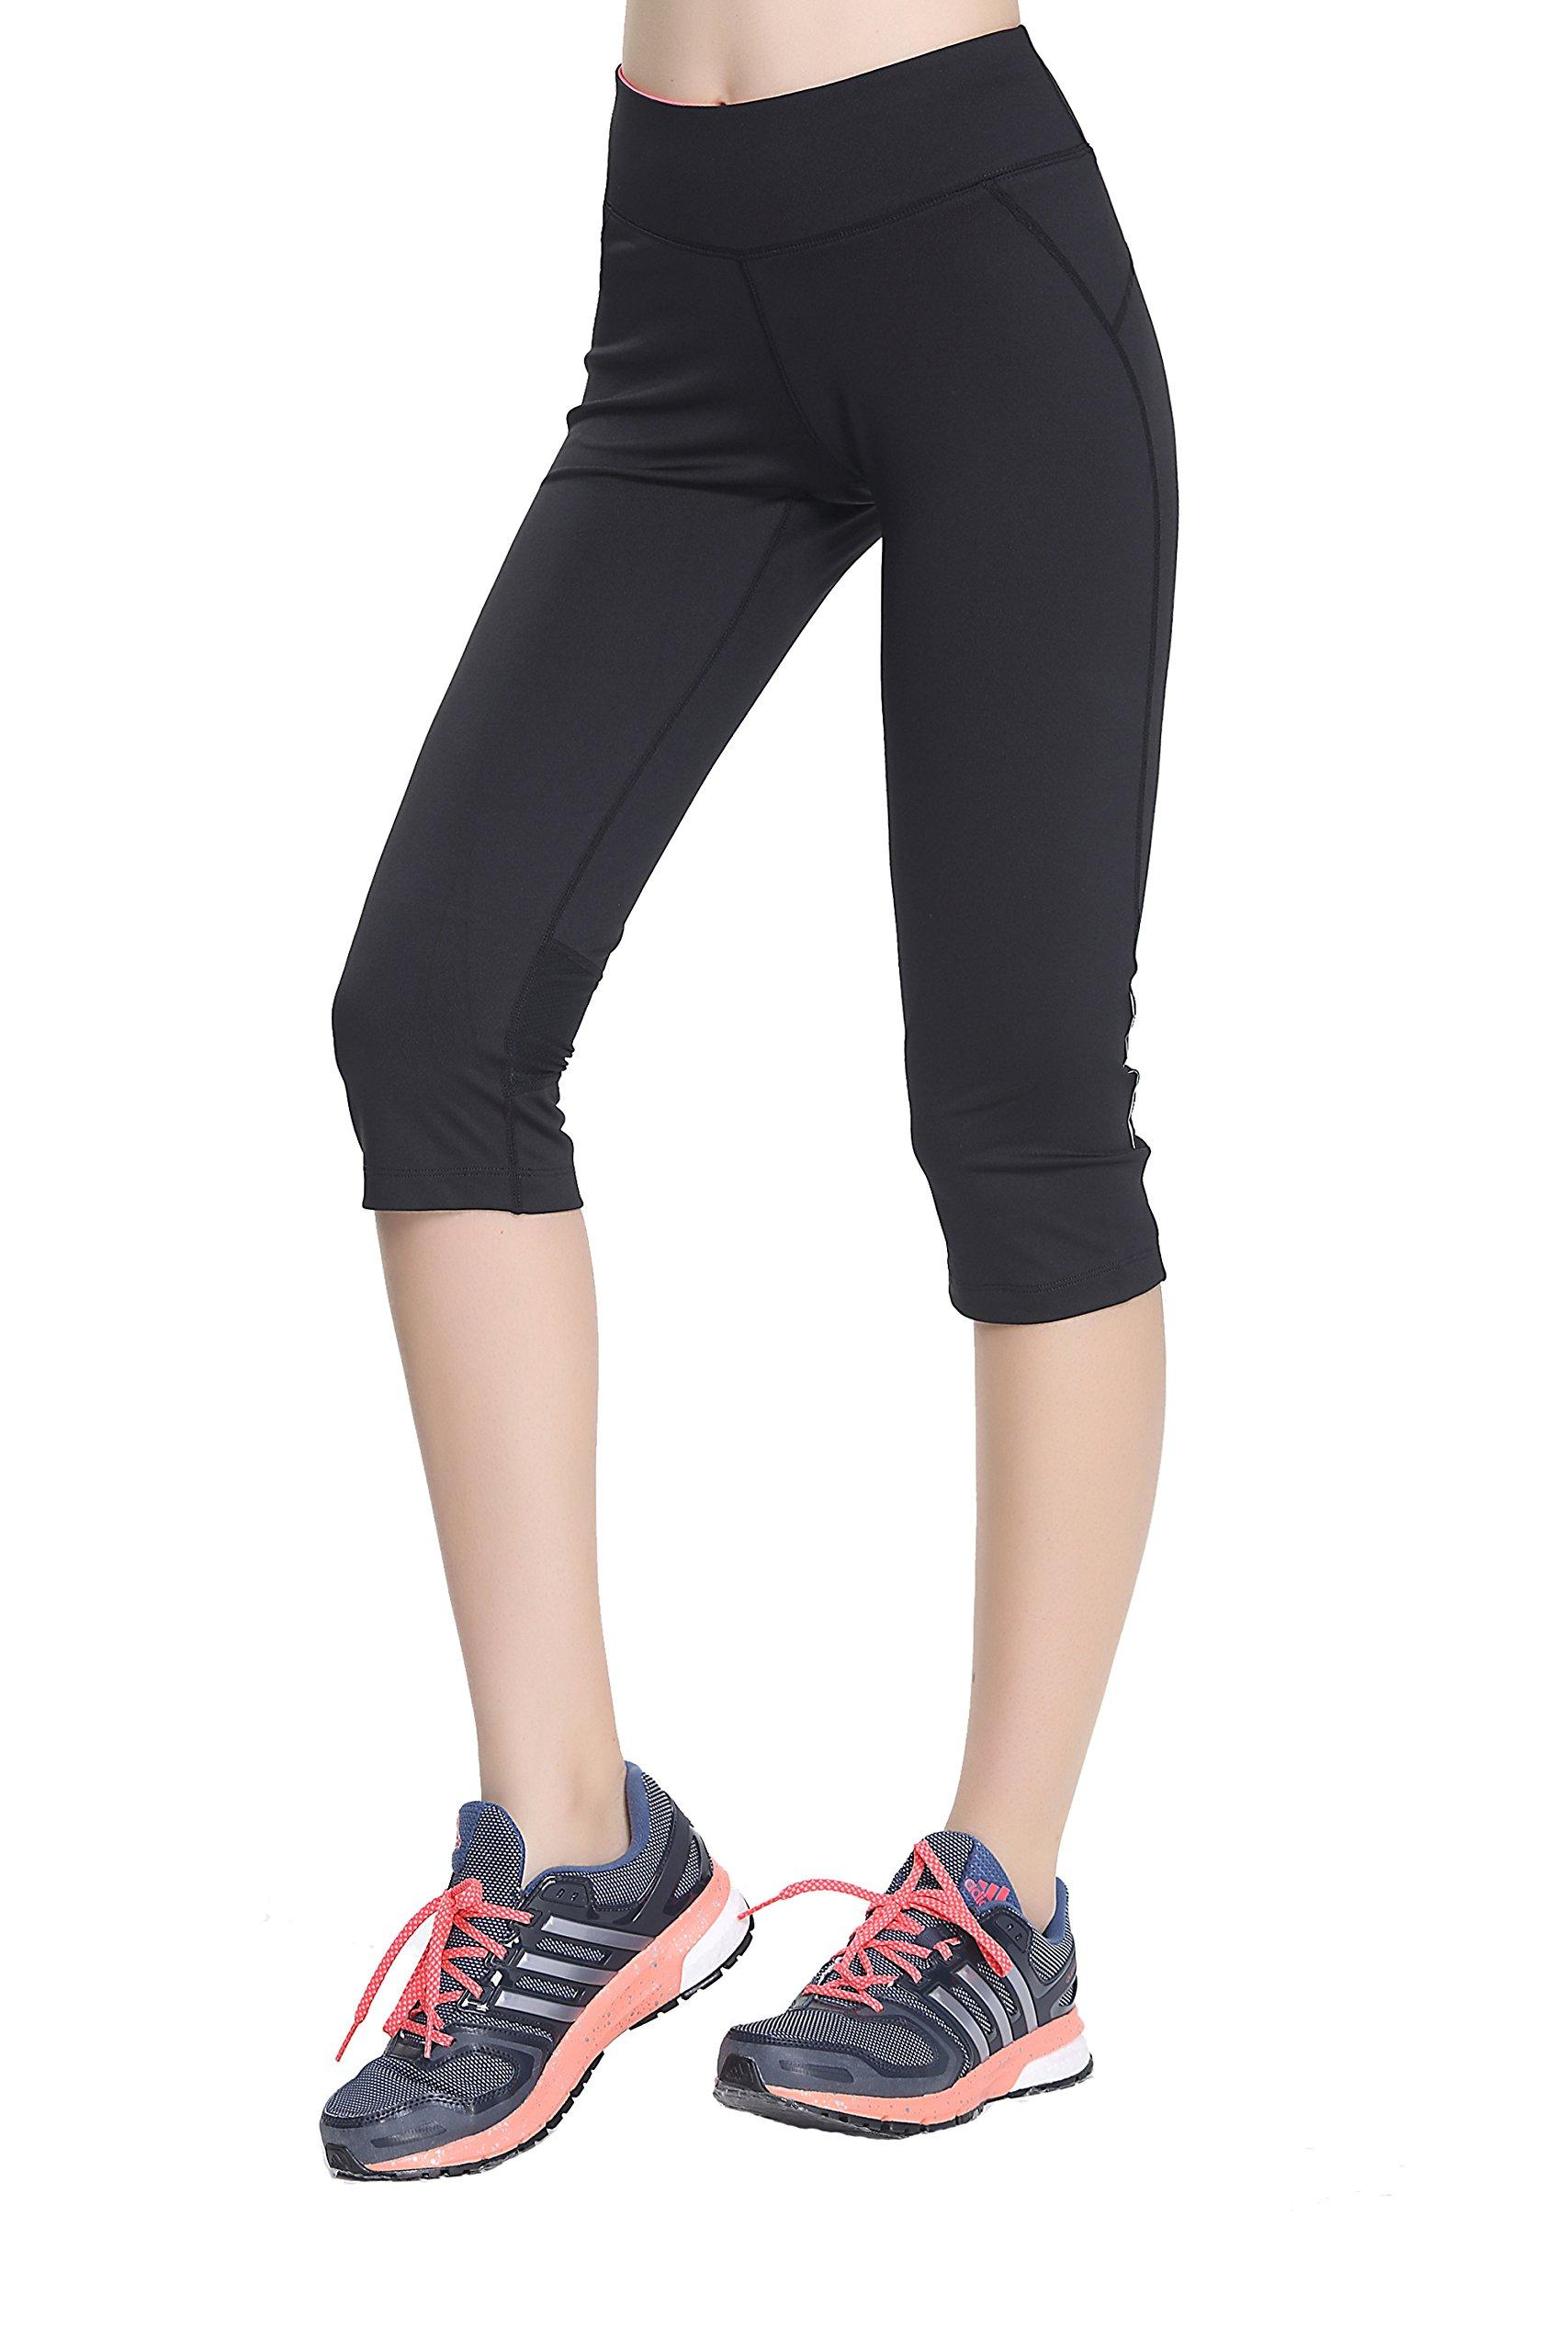 Women's Running Yoga Capris Leggings  Black Asian X-Large/US L